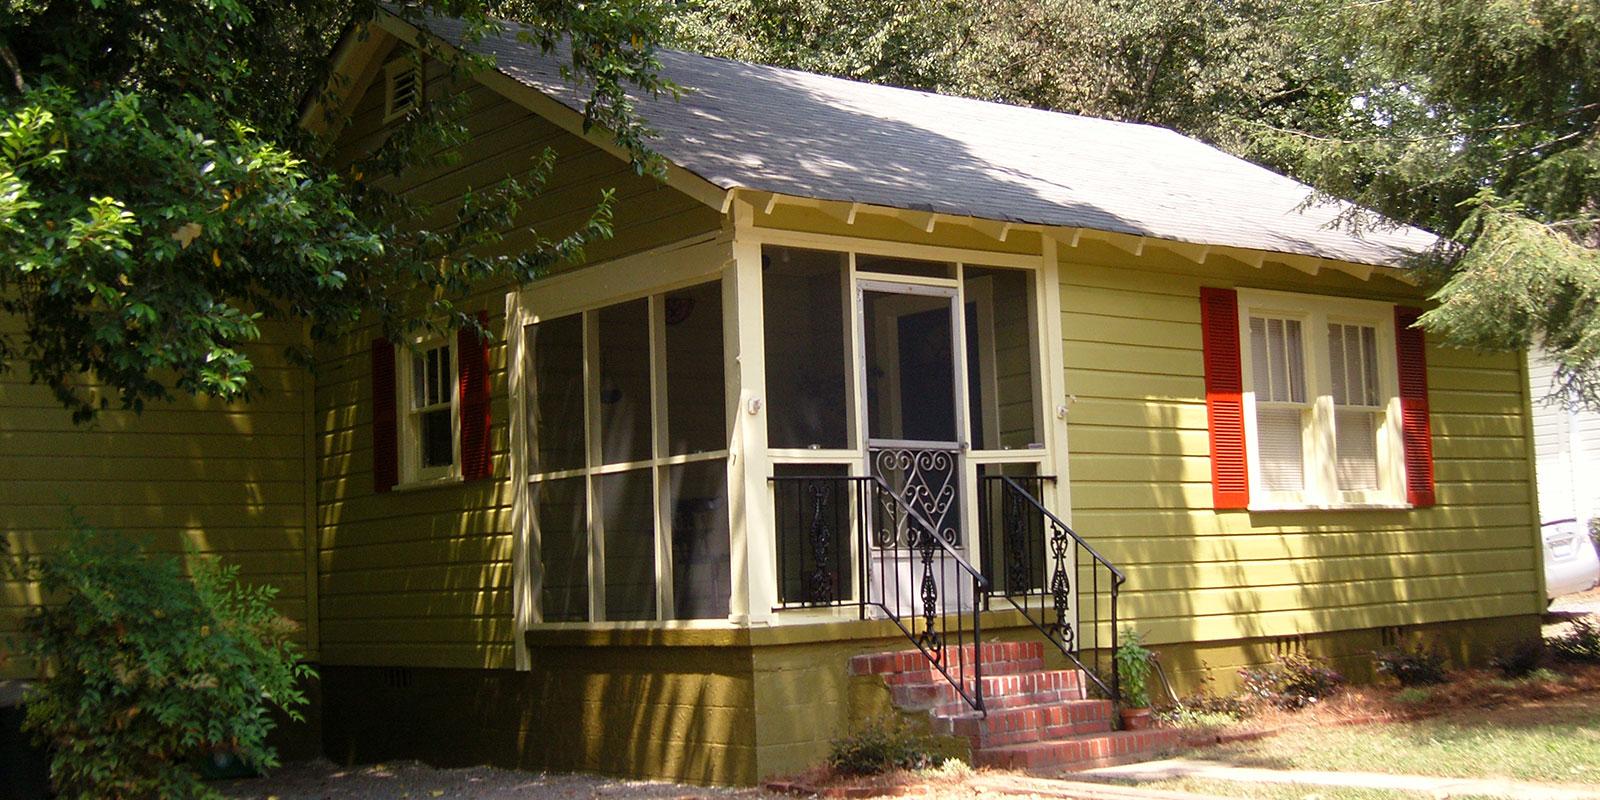 419 E 10th Street, Rome, Georgia 30161, 1 Bedroom Bedrooms, ,1 BathroomBathrooms,House,Rental,E 10th Street,1076